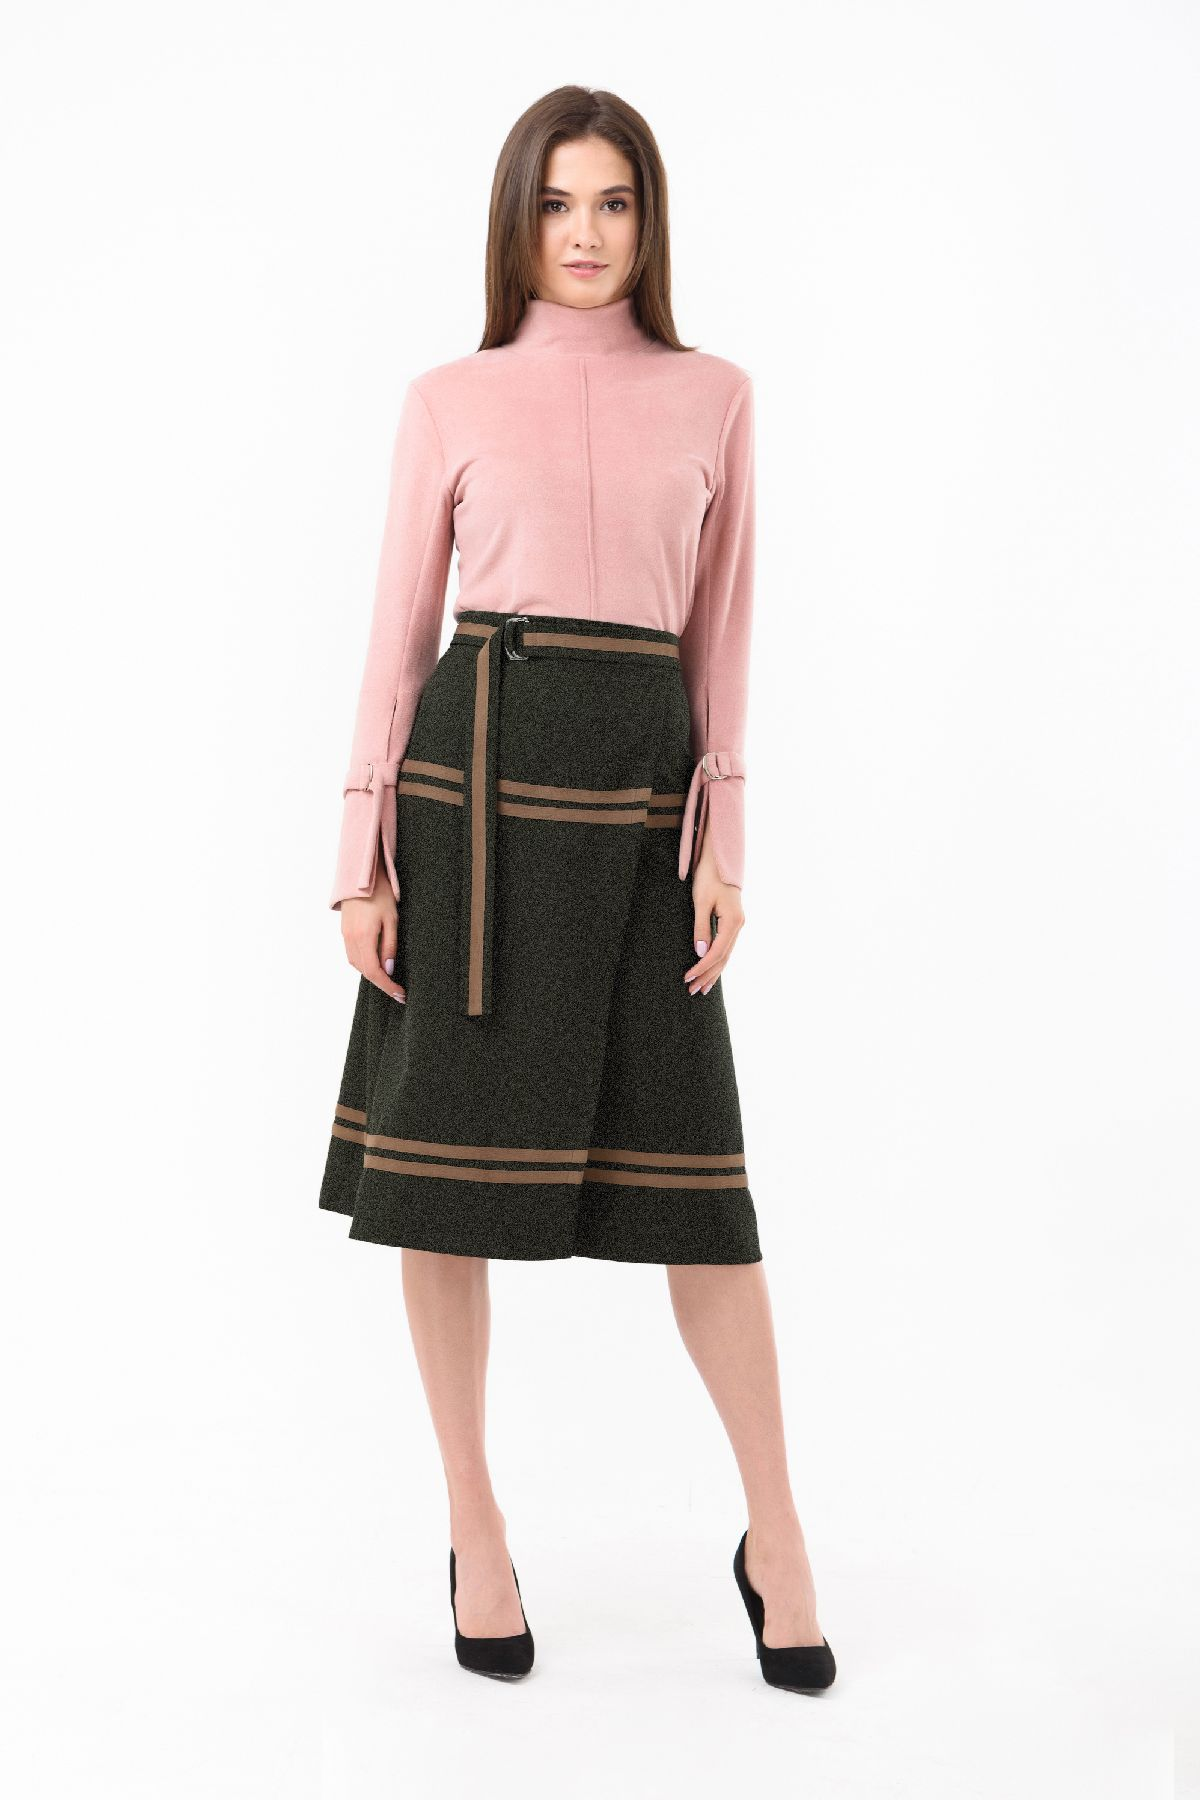 b8dcd11242e Классическая юбка а-силуэта RM1844-18DU